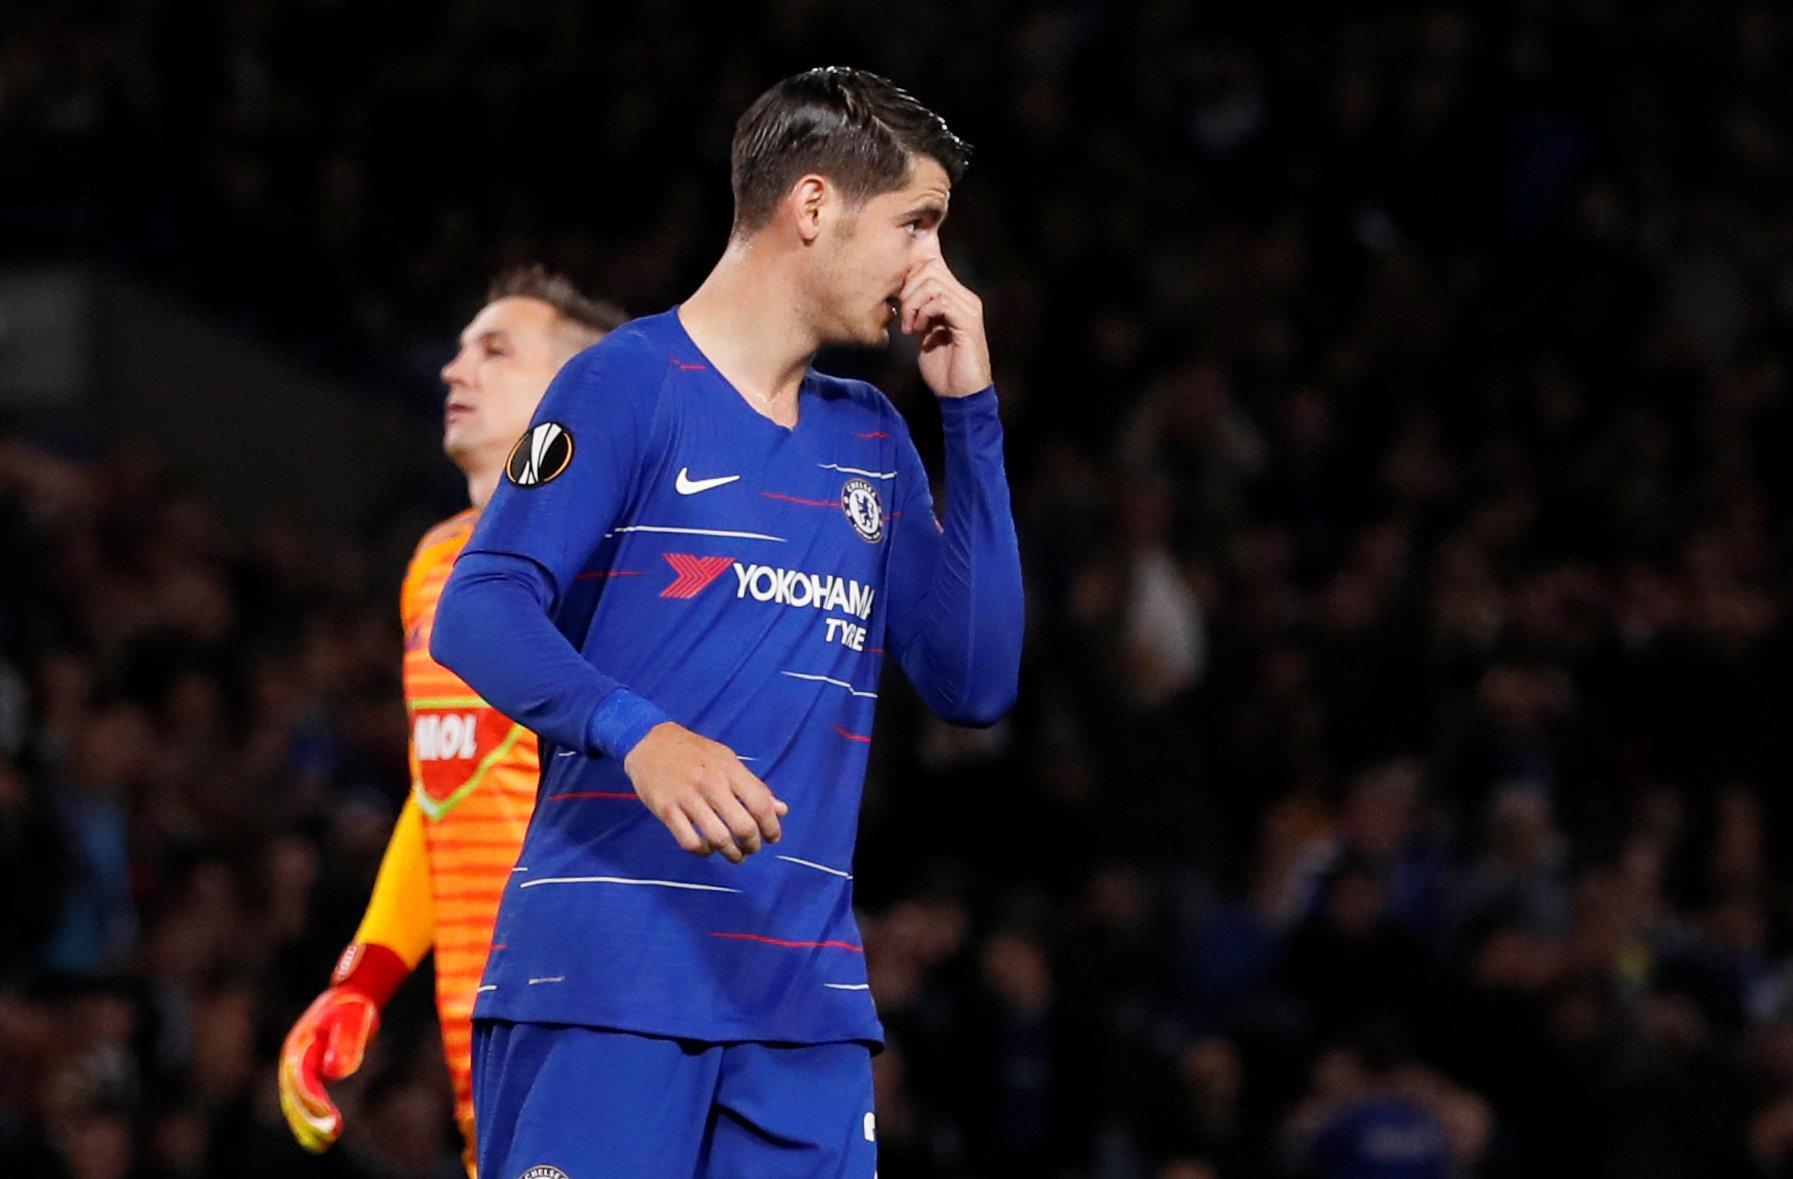 The striker couldn't believe he hadn't even hit the target